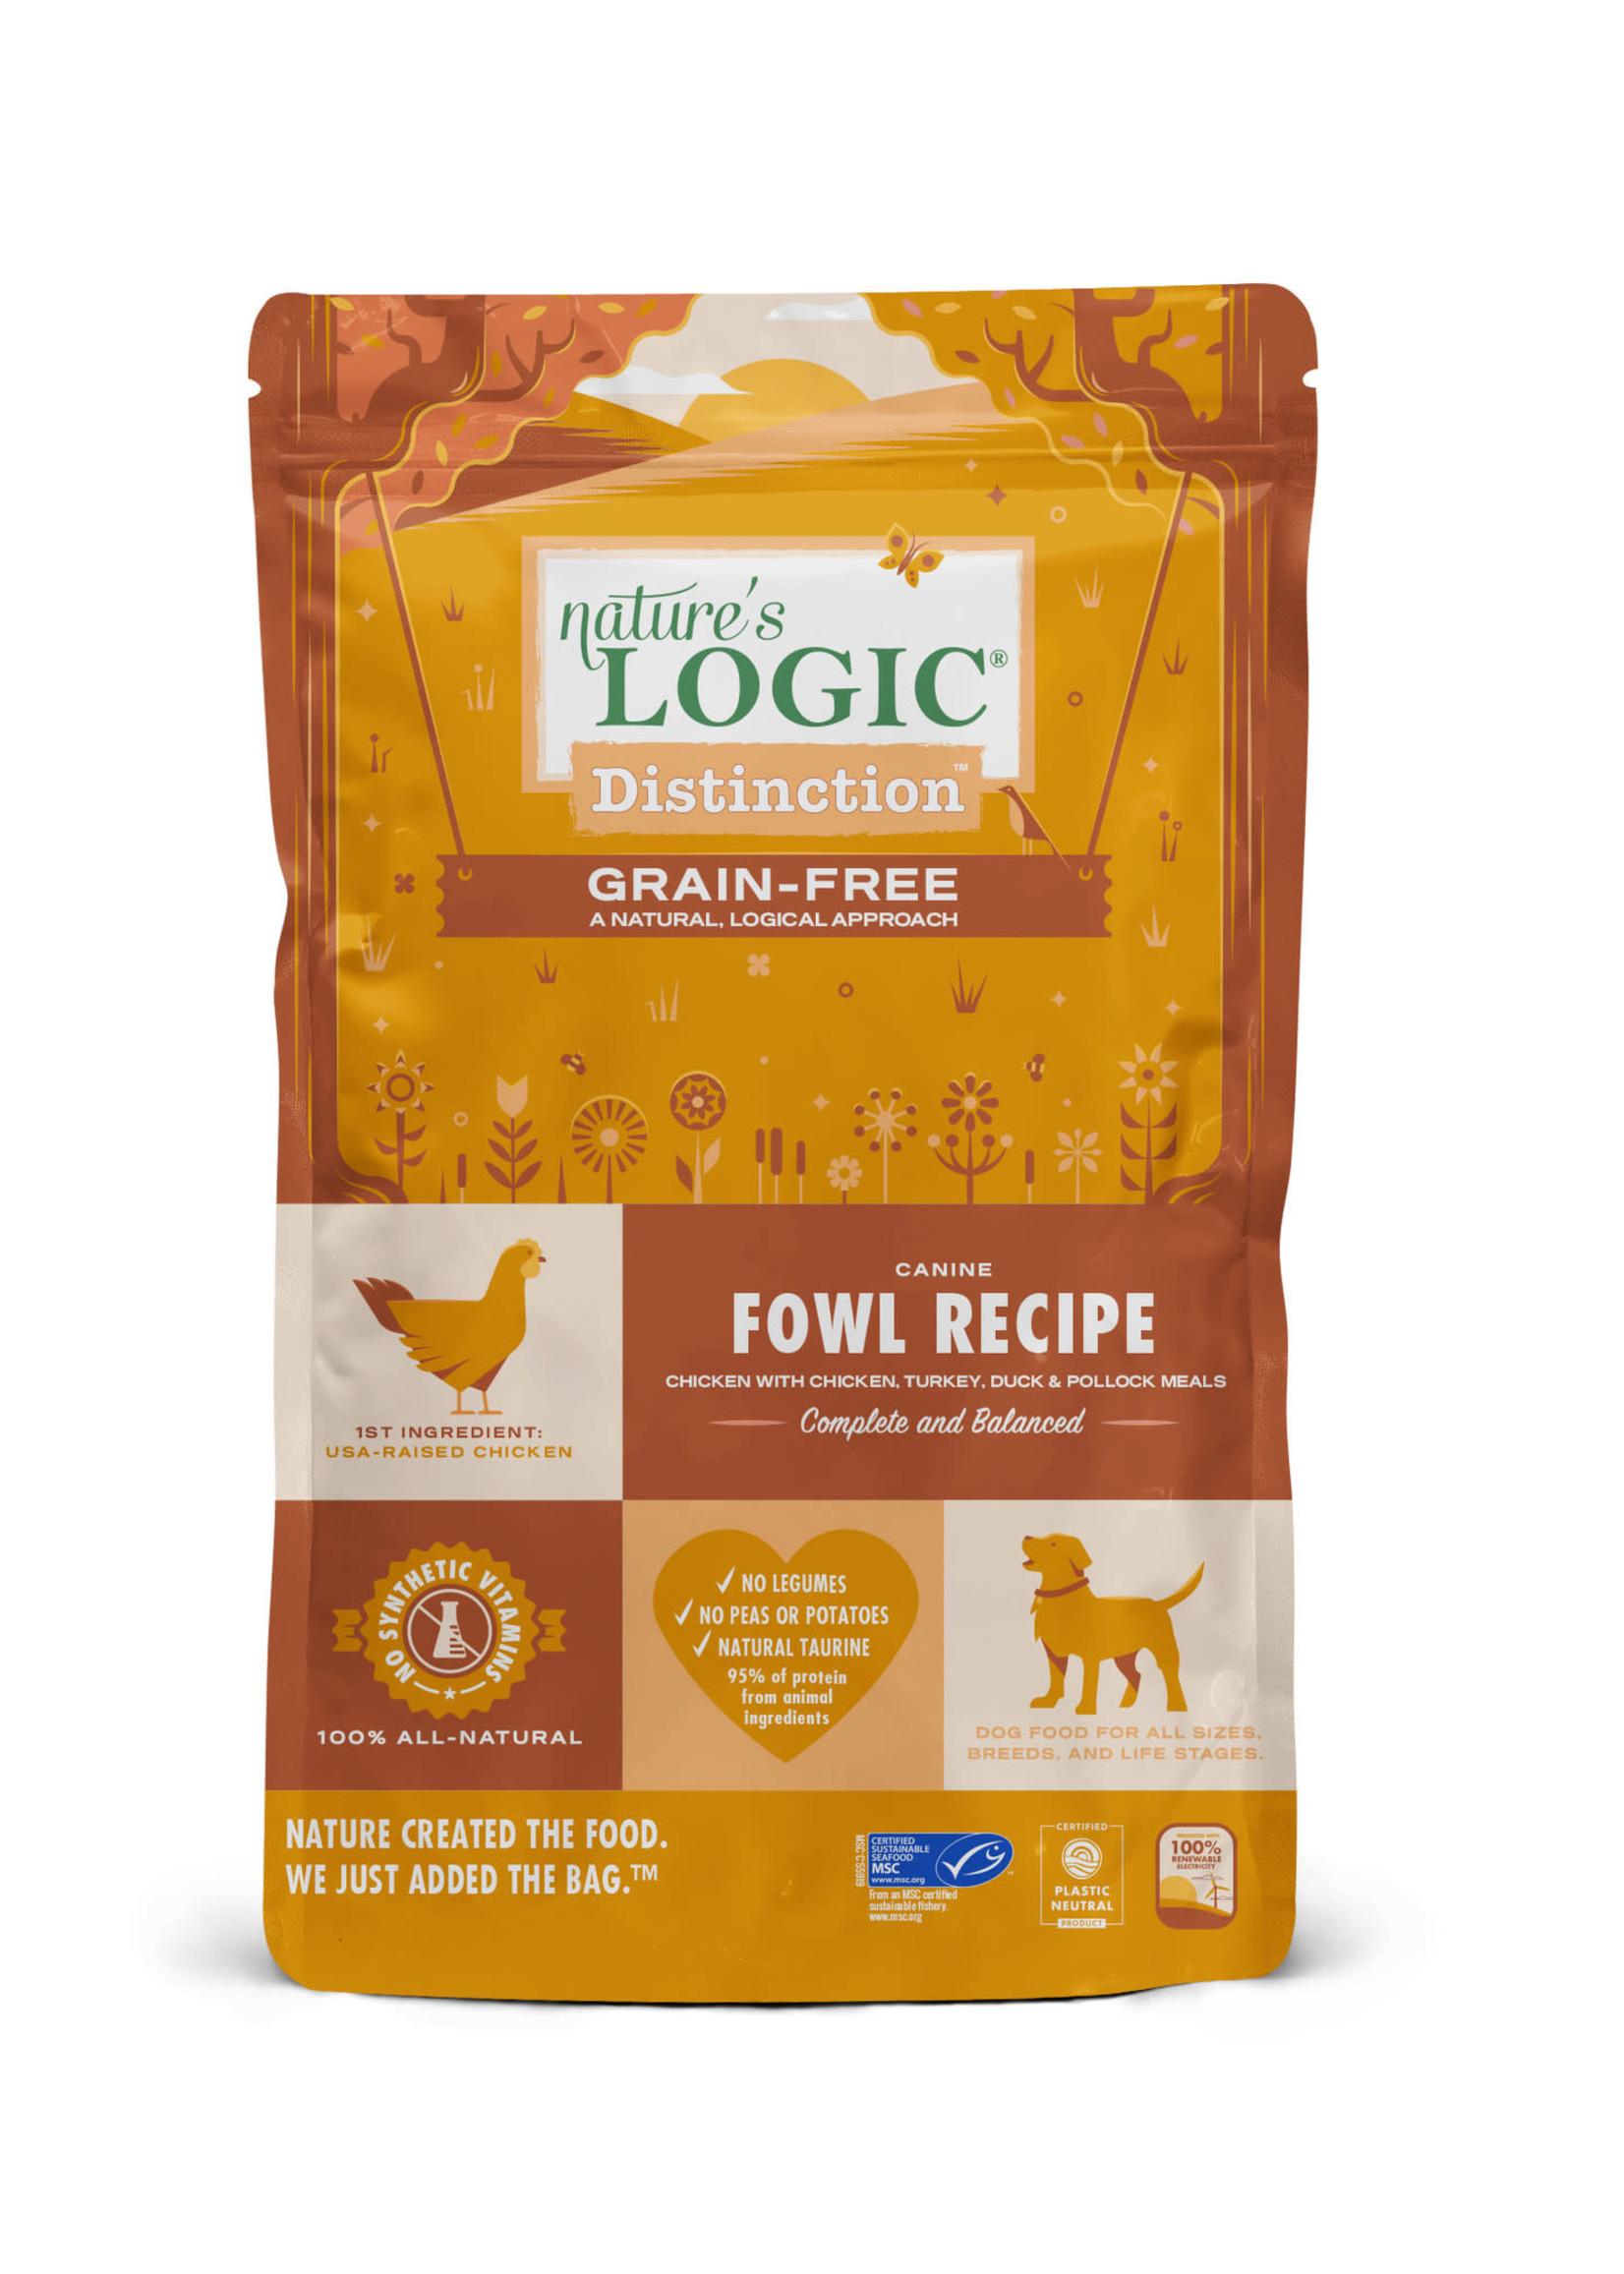 Nature's Logic Nature's Logic Distinction Grain-Free Fowl Dry Dog Food 4.4lbs